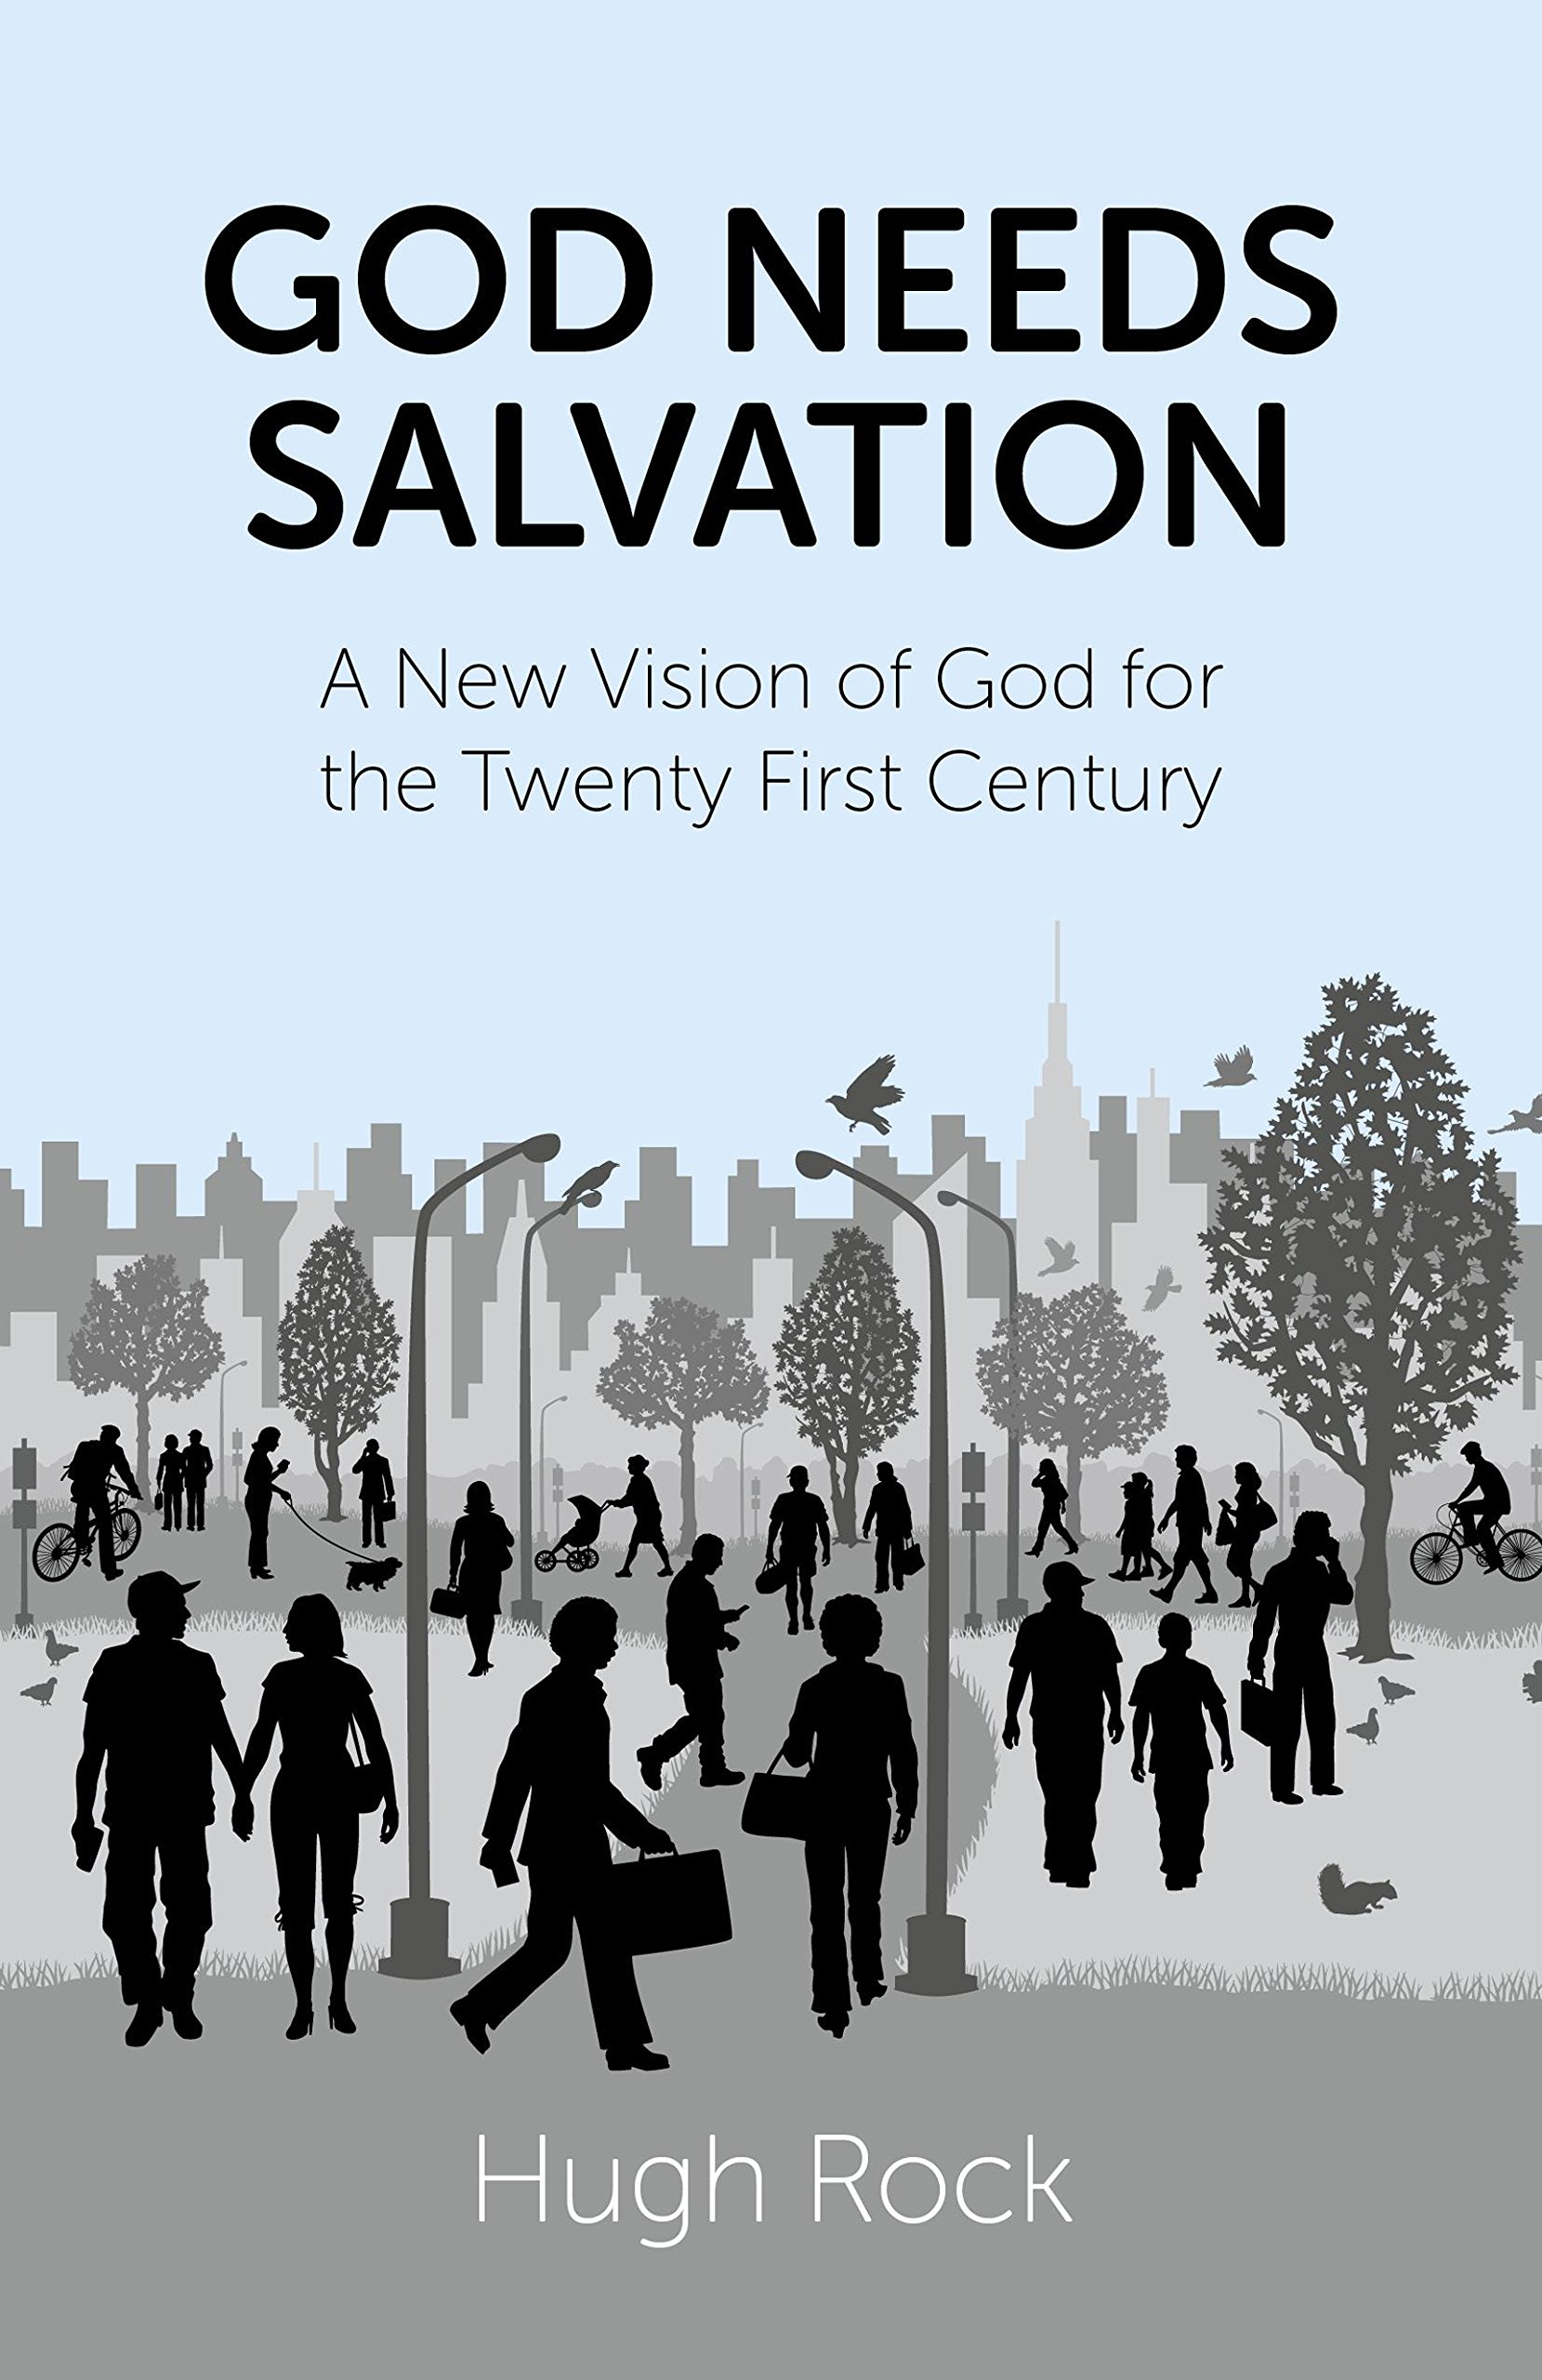 Book review: God Needs Salvation